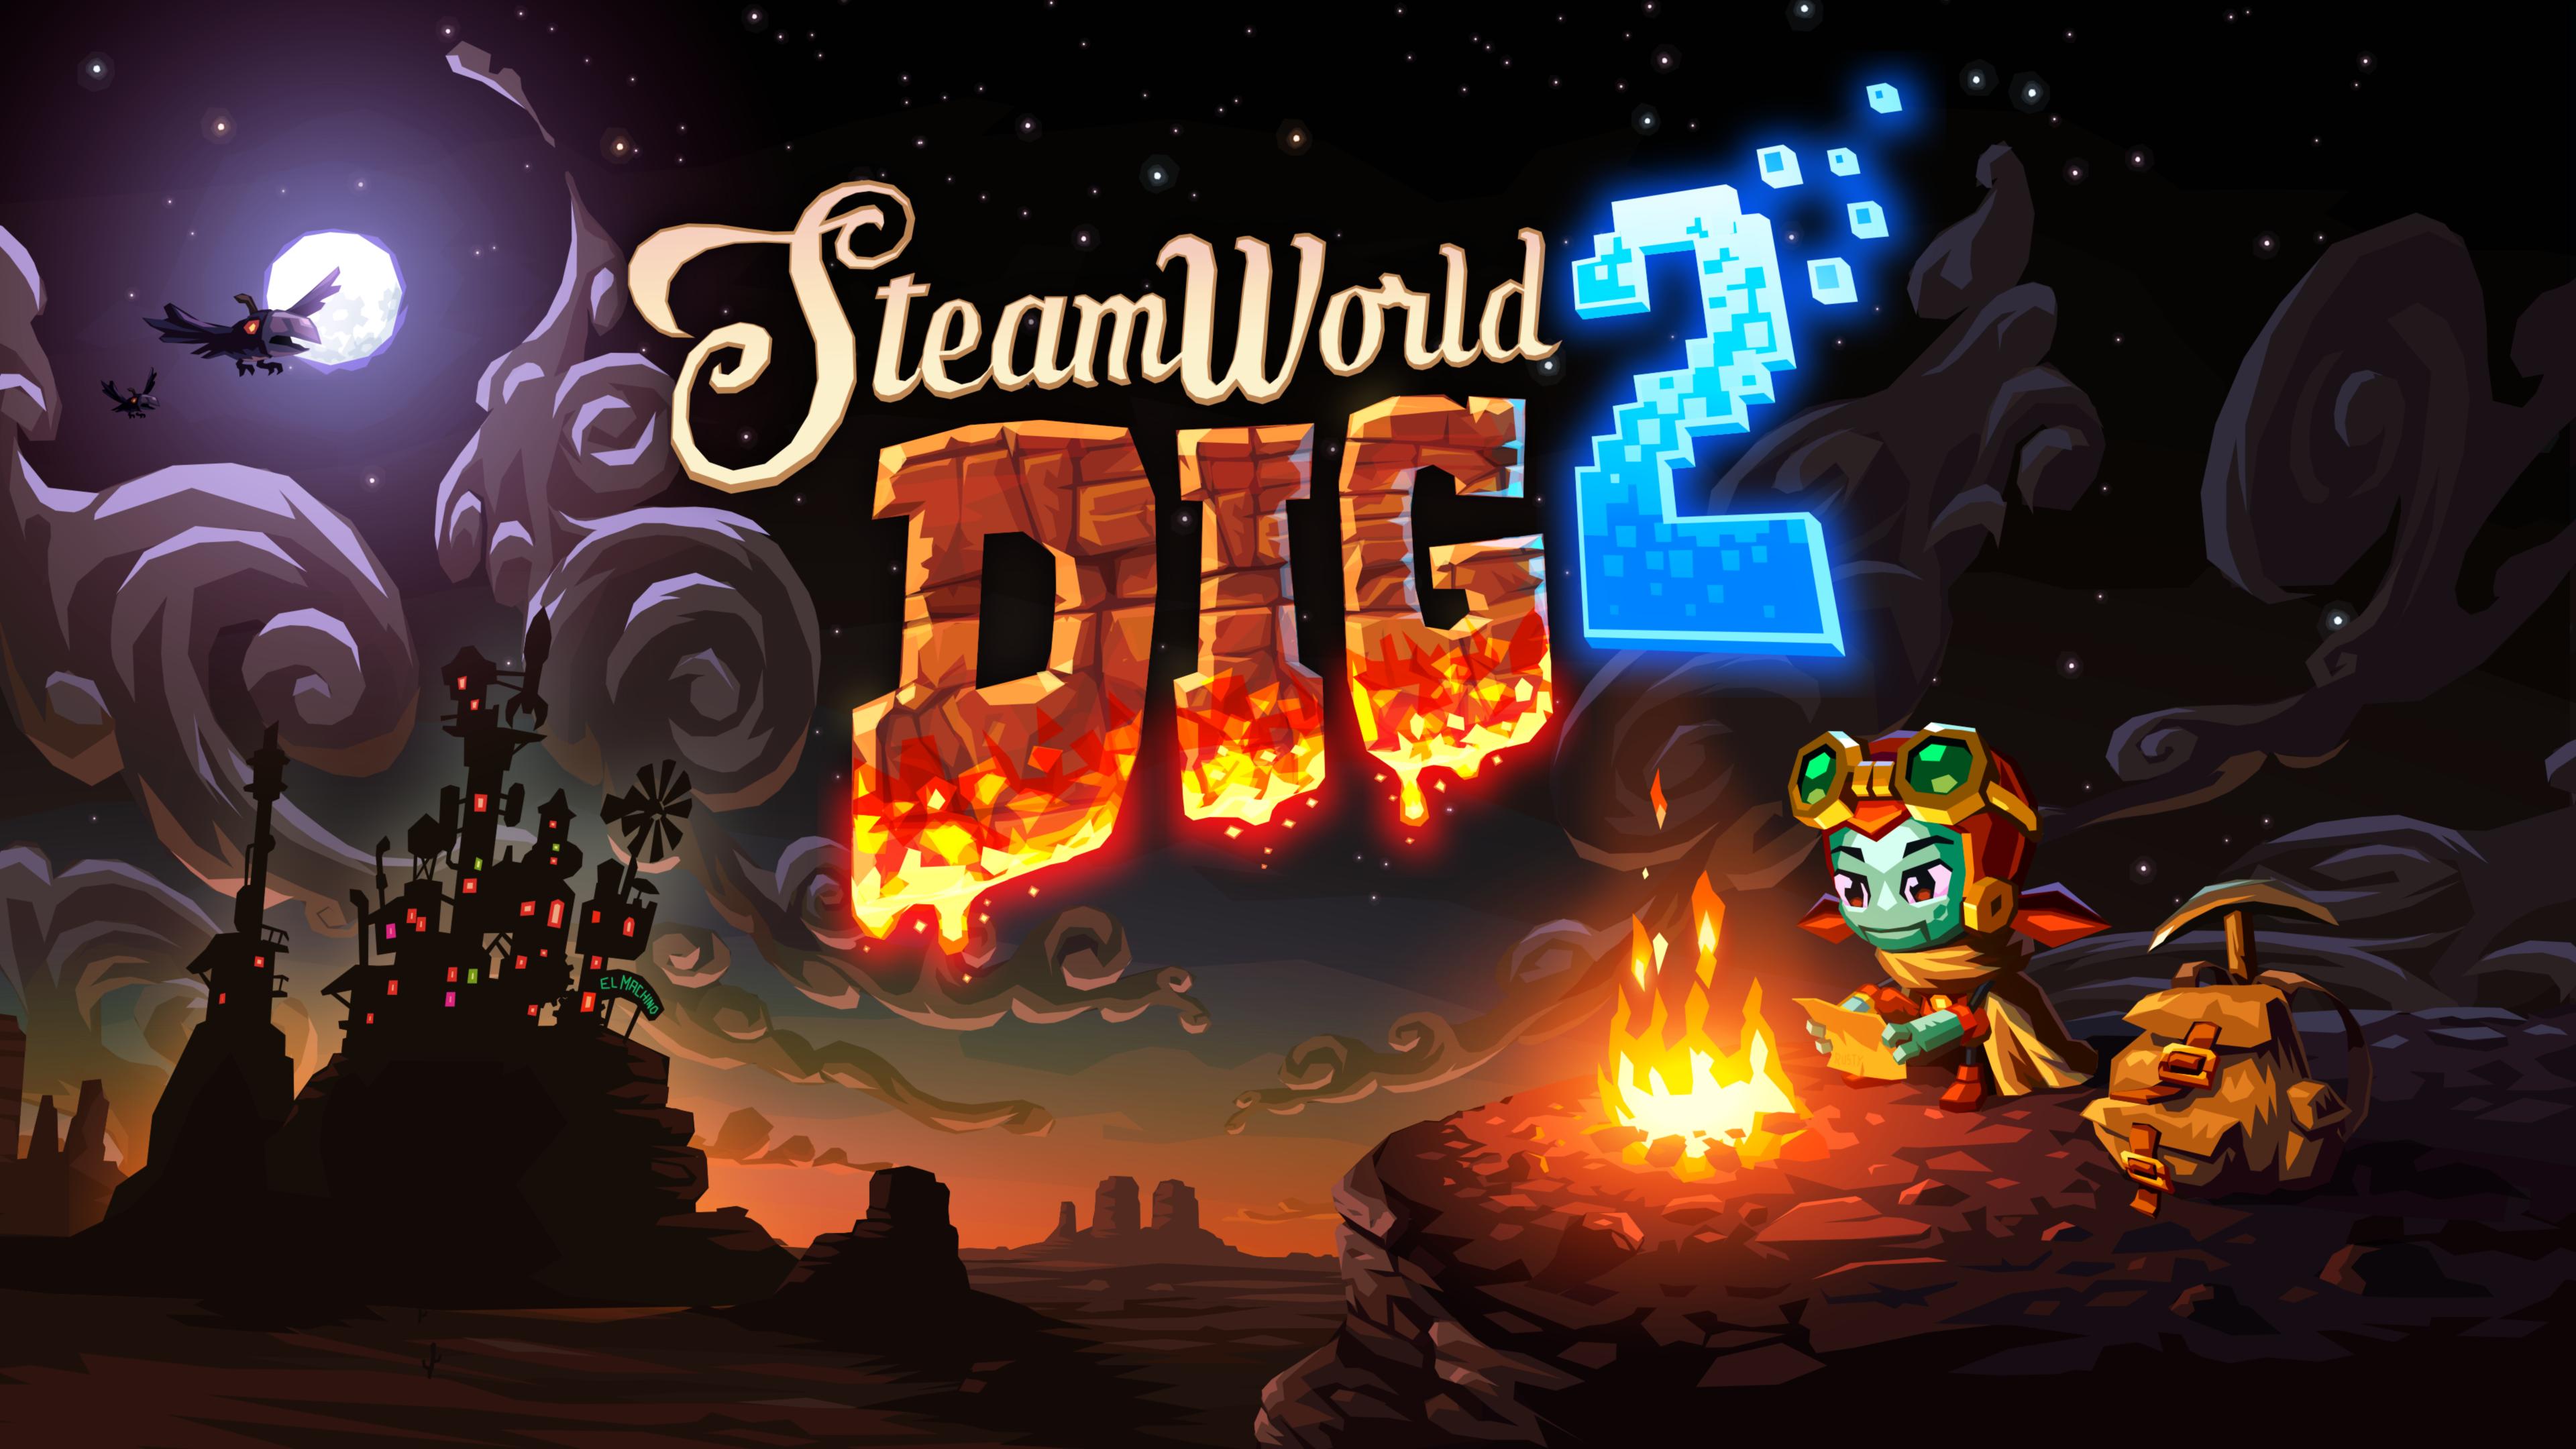 download steamworld dig 2 free